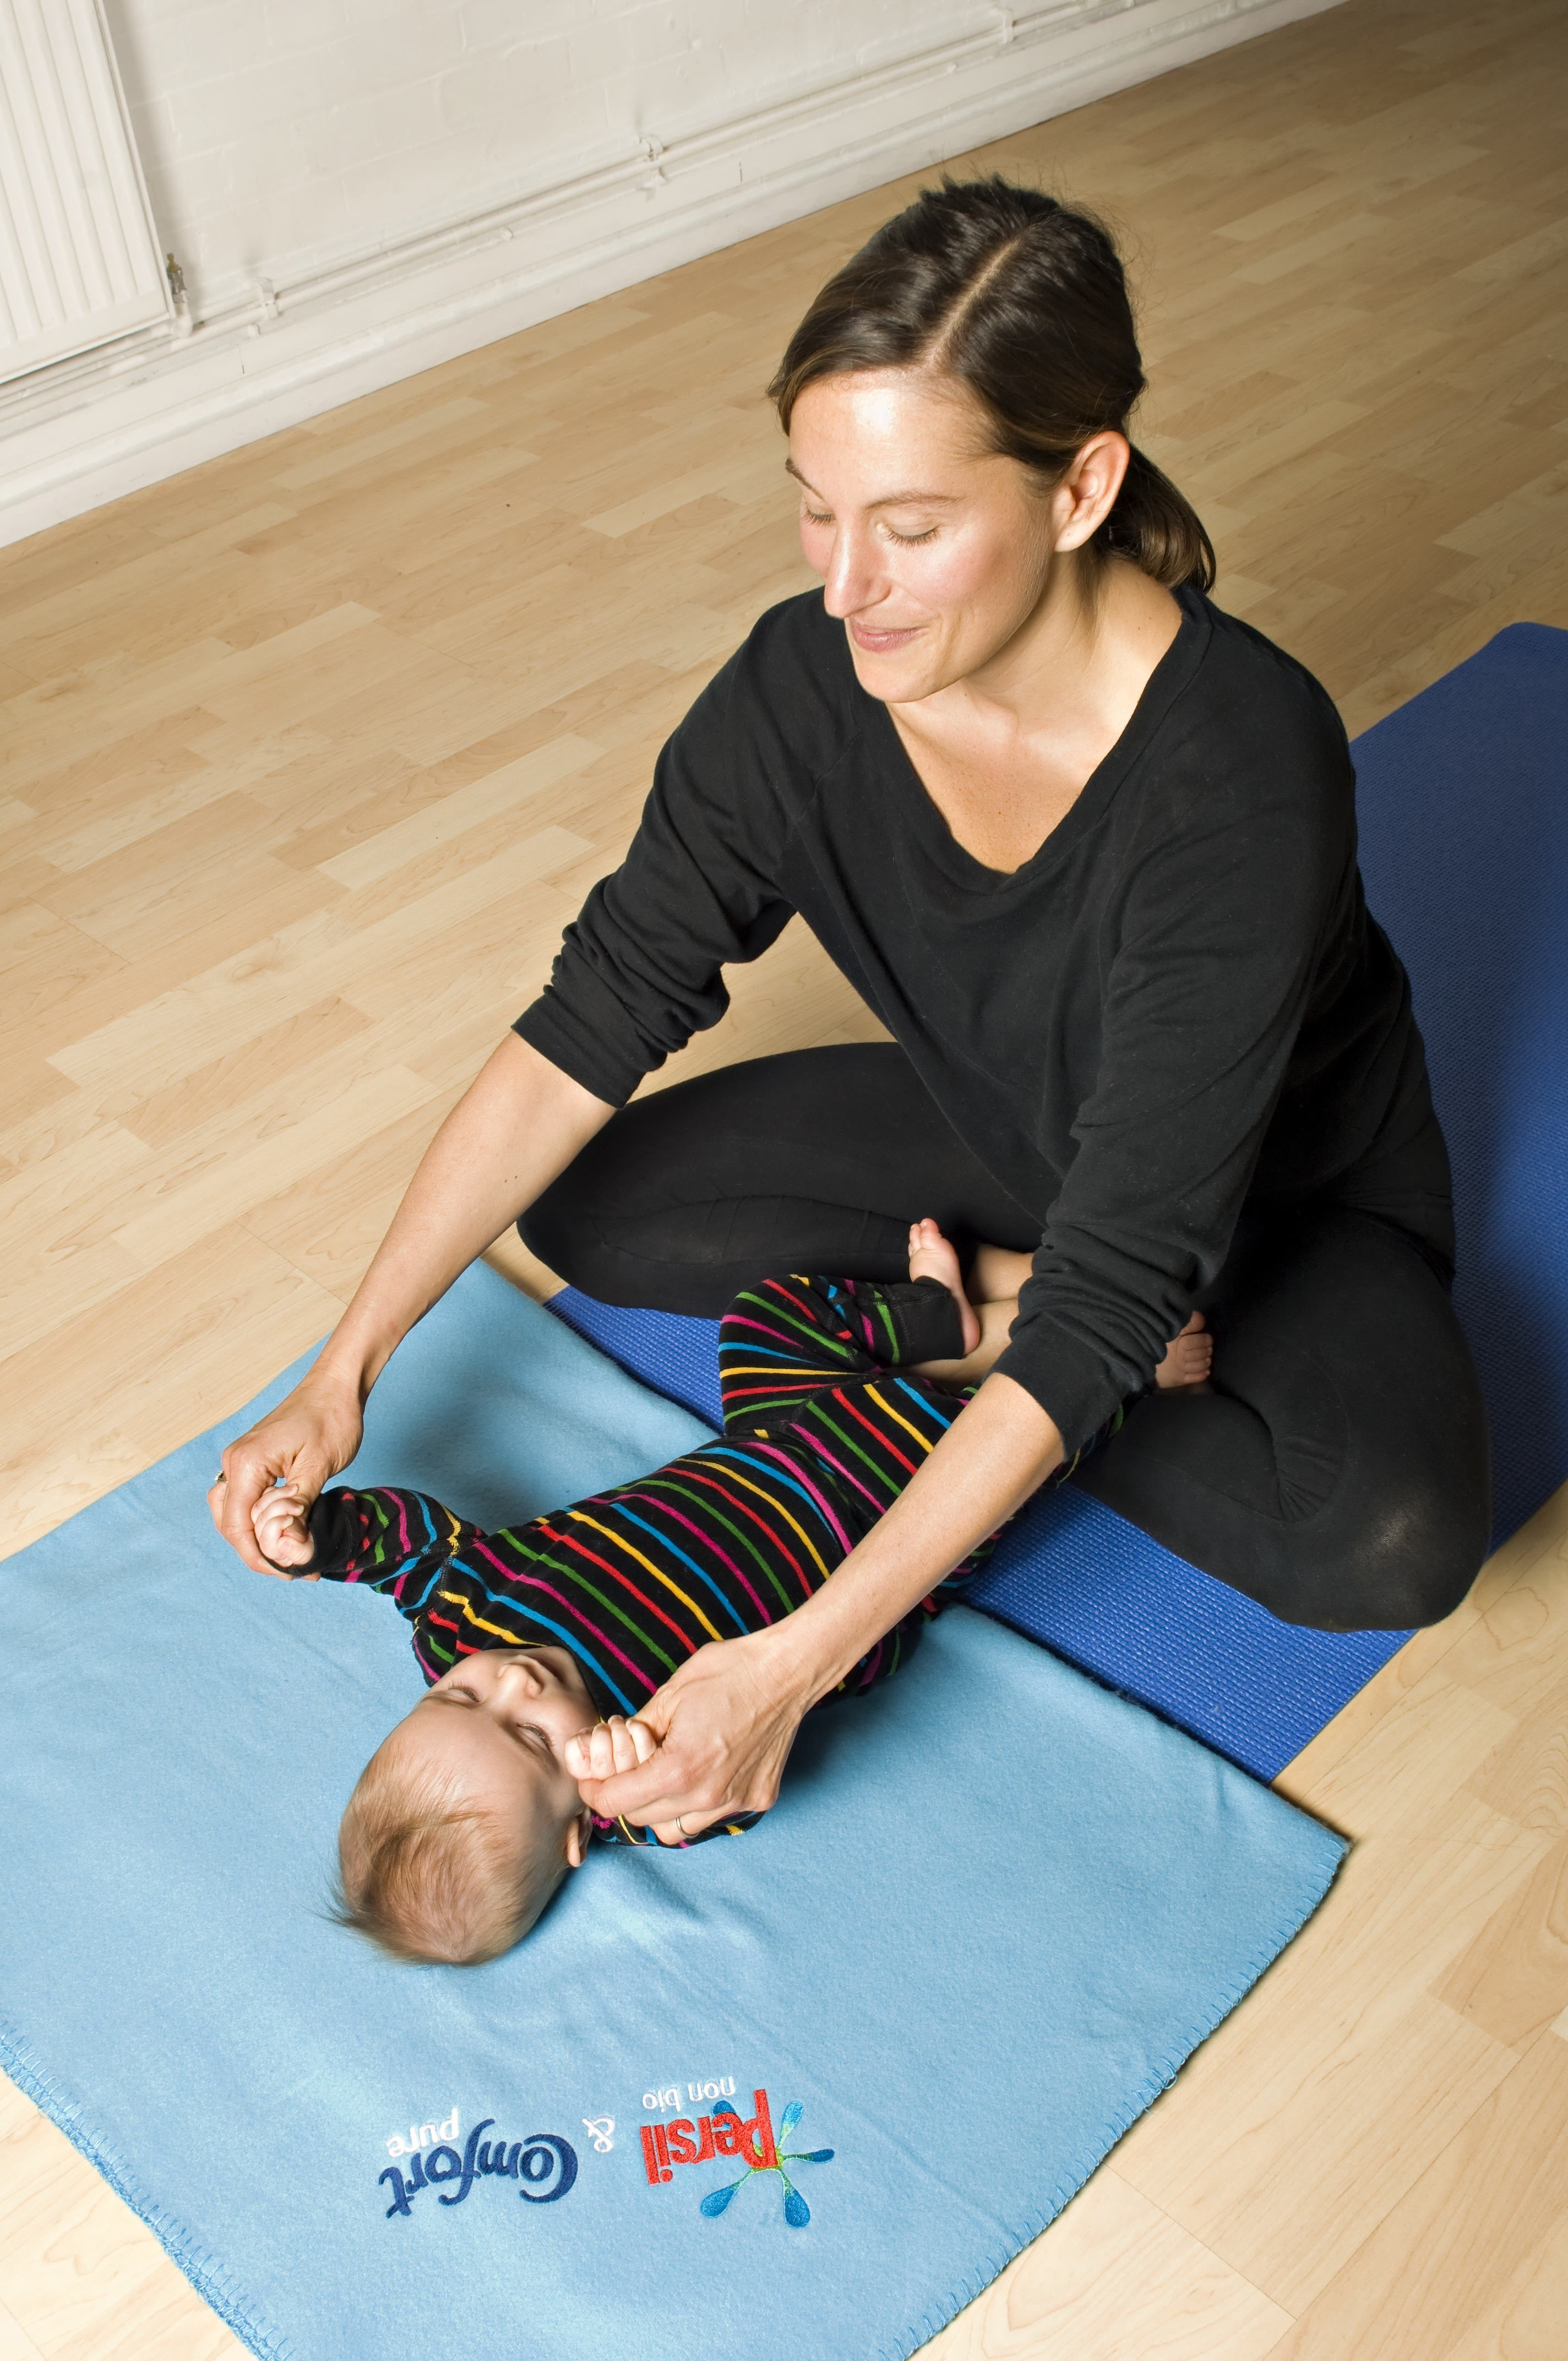 Baby Yoga Guide London Mums Magazine Baby Yoga Mom And Baby Yoga Mommy And Baby Yoga